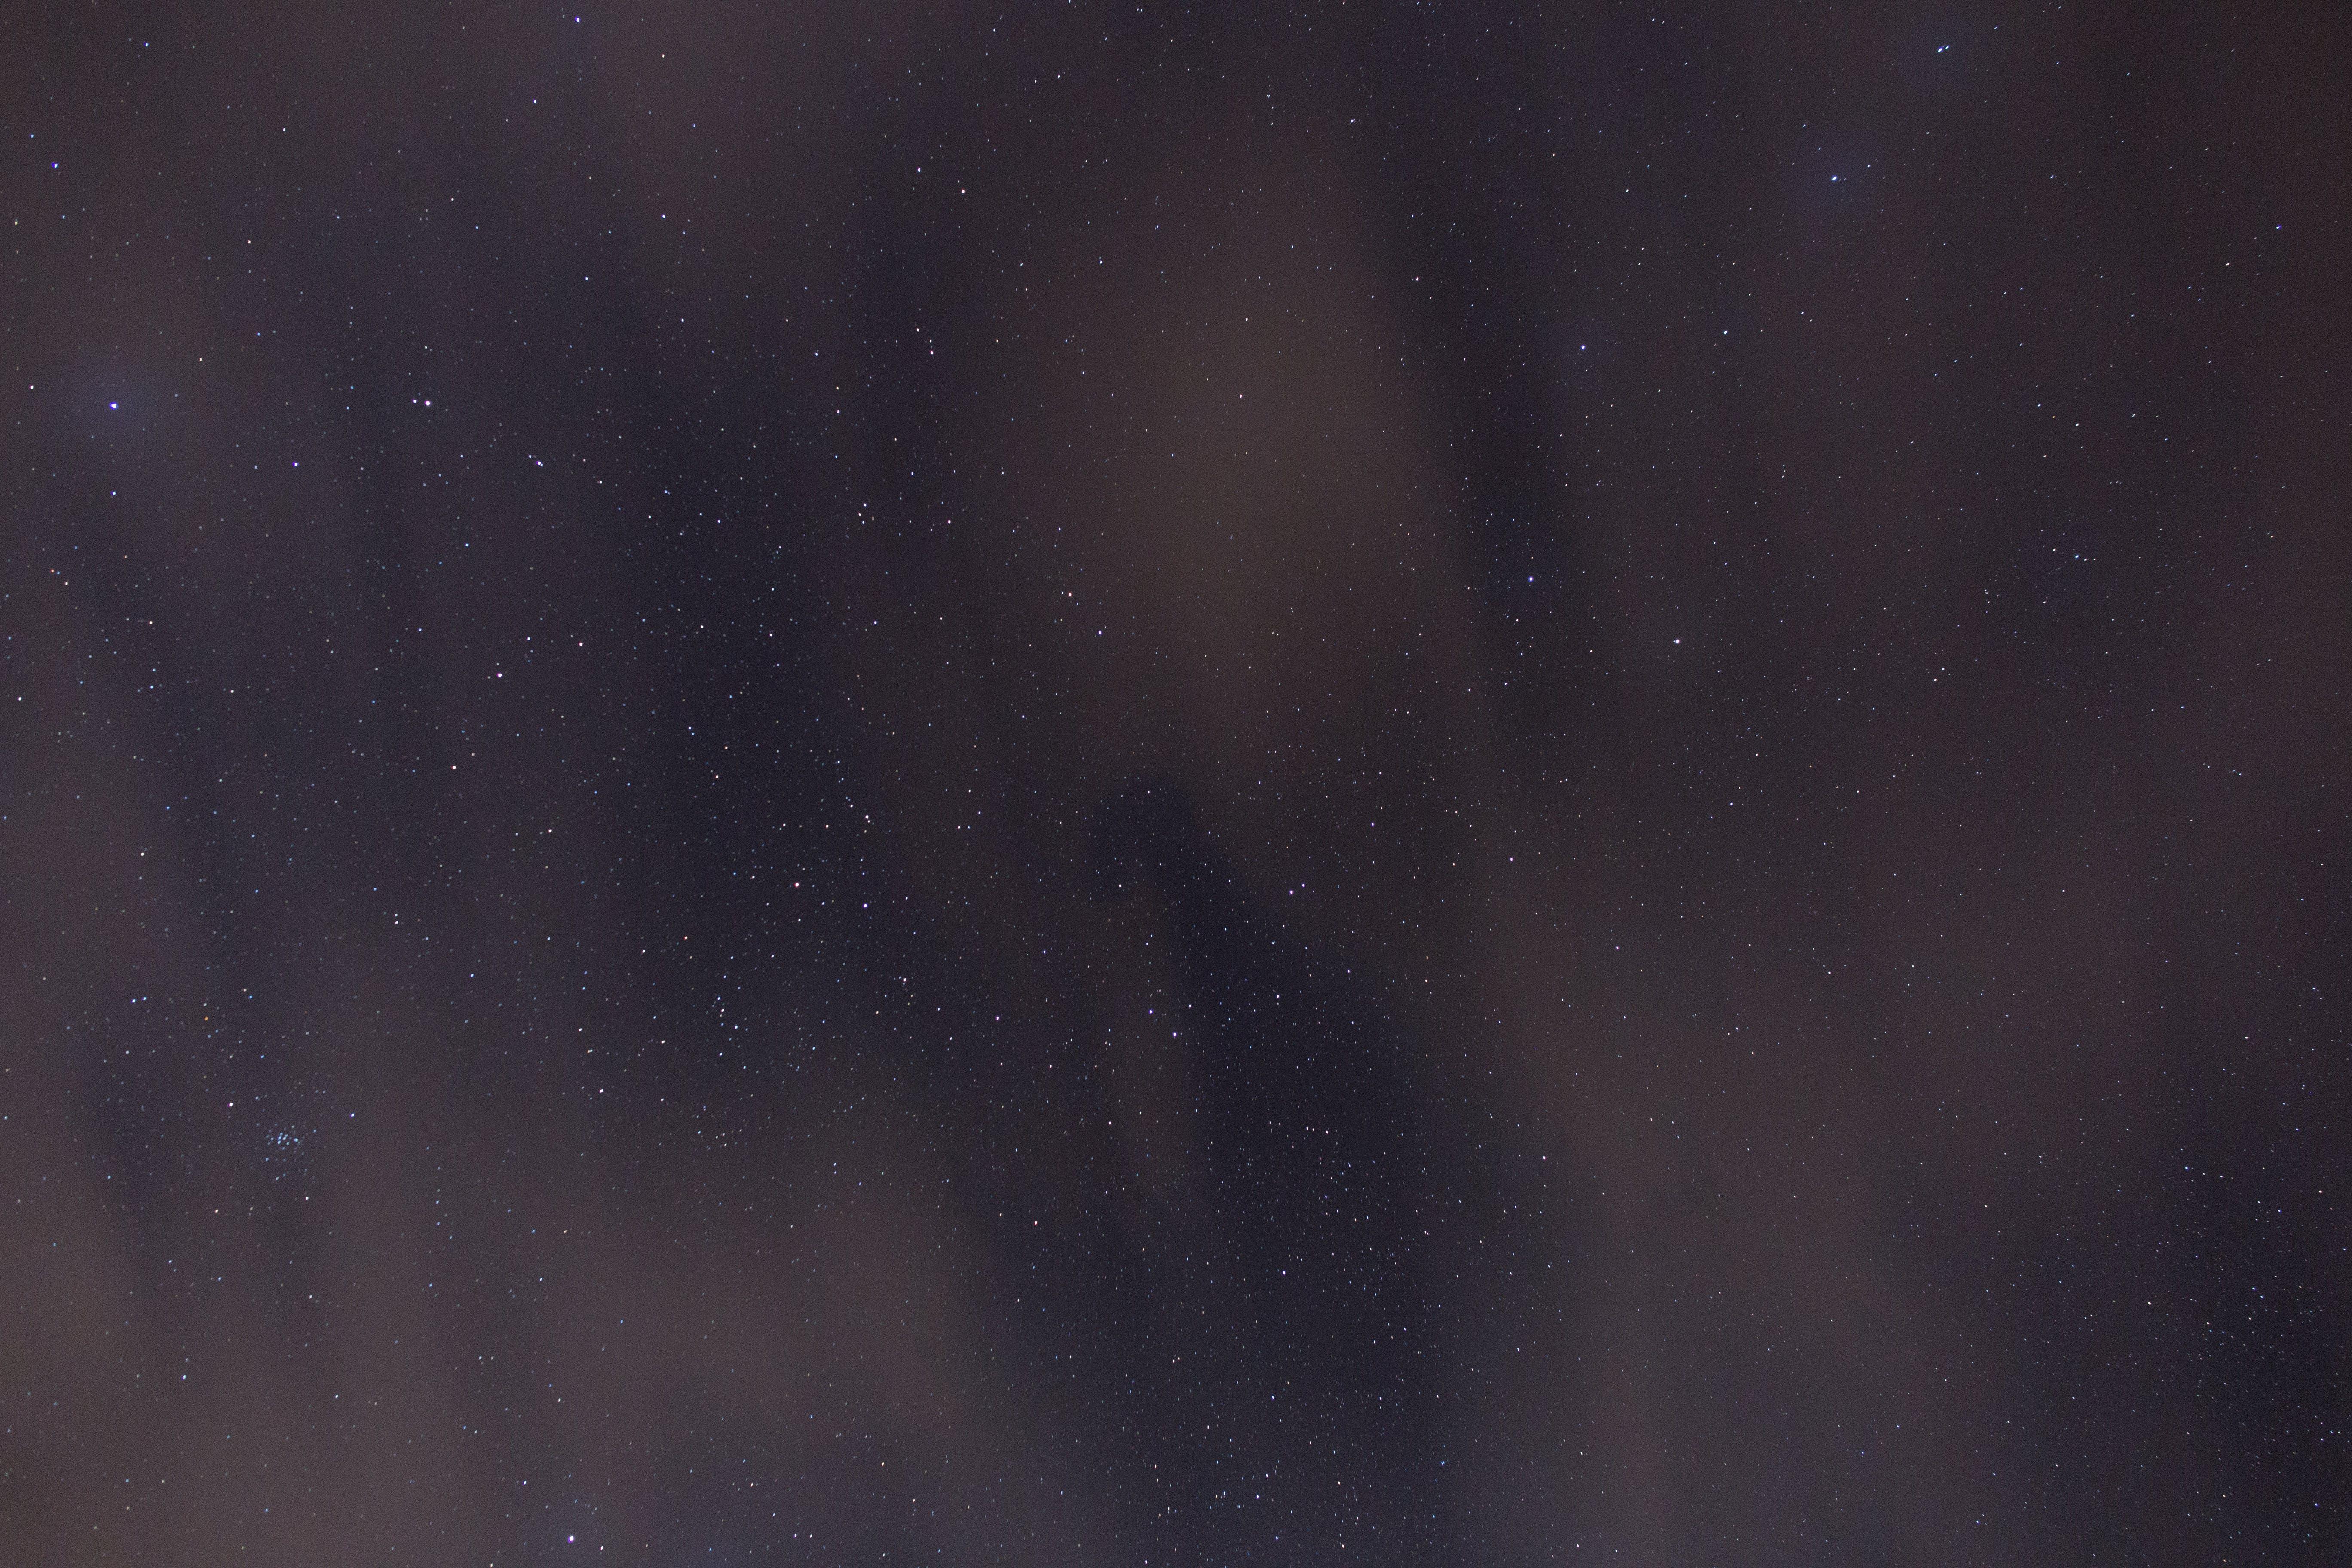 Kostenloses Stock Foto zu astronomie, dunkel, farben, himmel